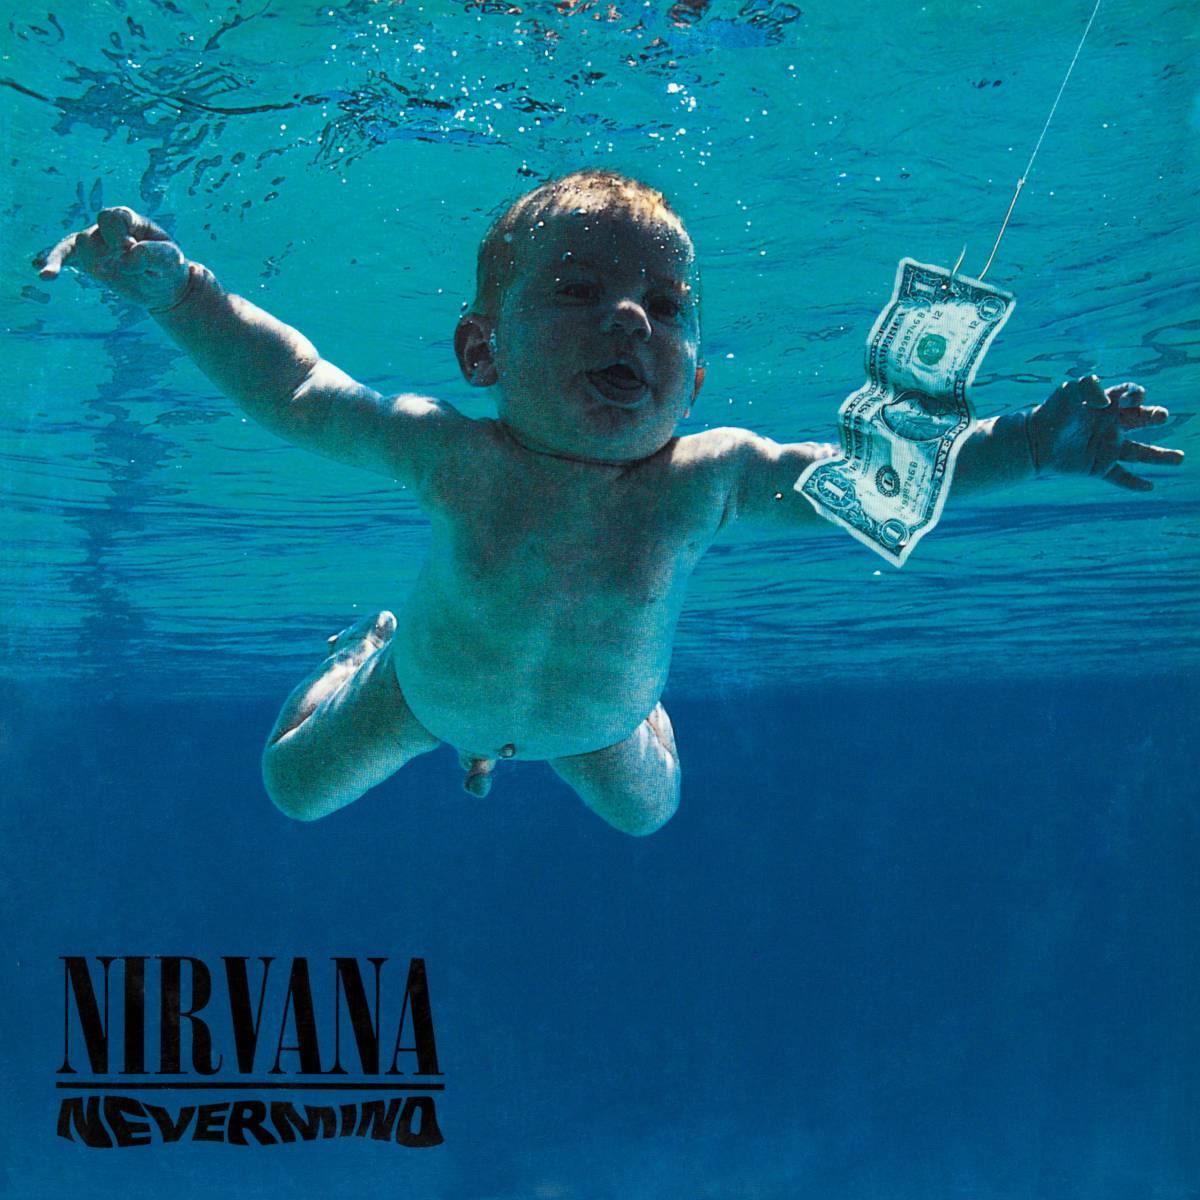 Nervermind cover of Nirvana